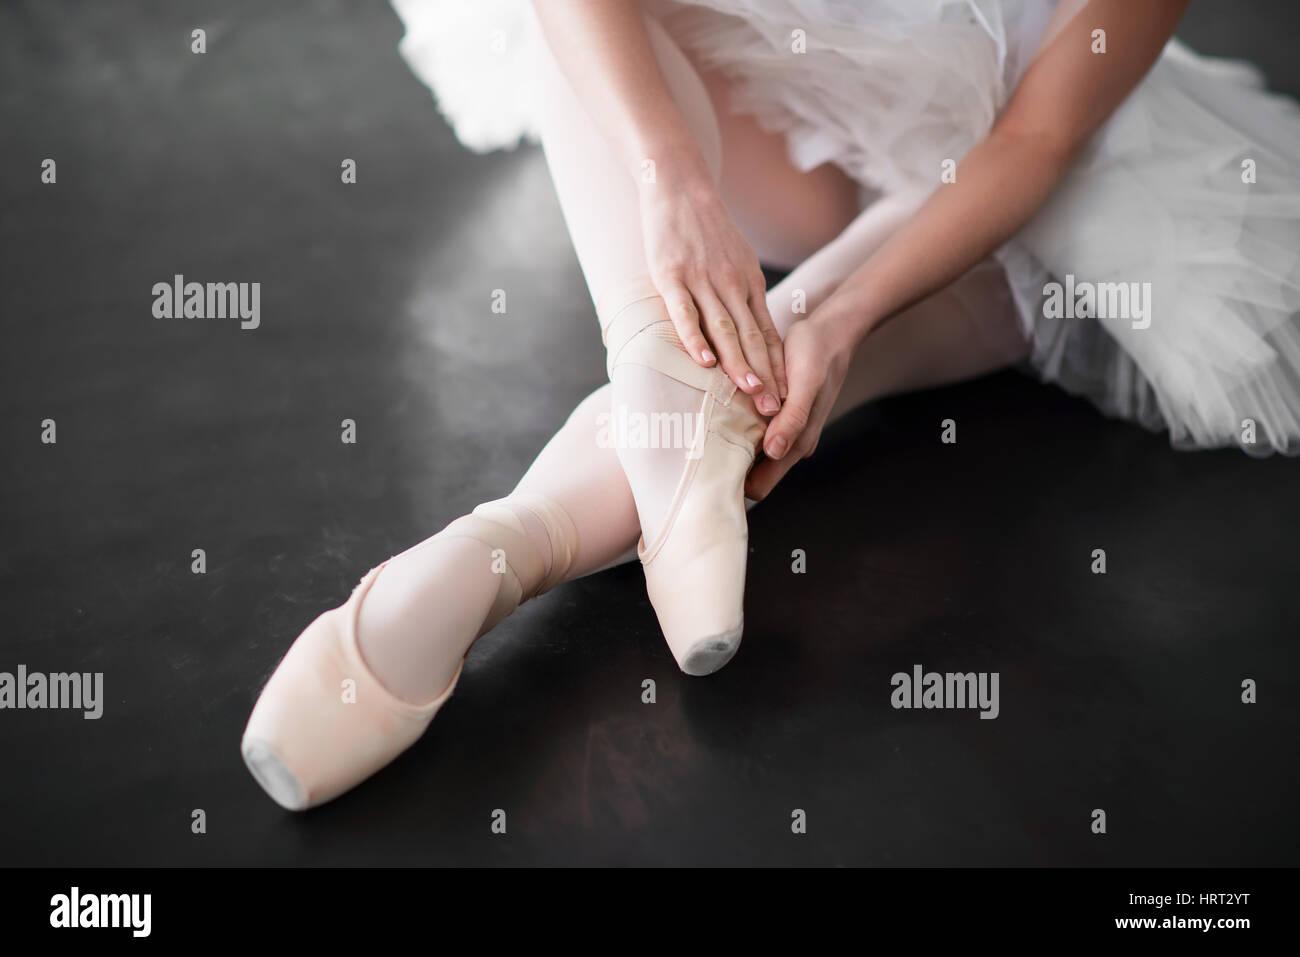 Ballet dancer legs in pointe shoes closeup. Ballerina rehearsal in class - Stock Image